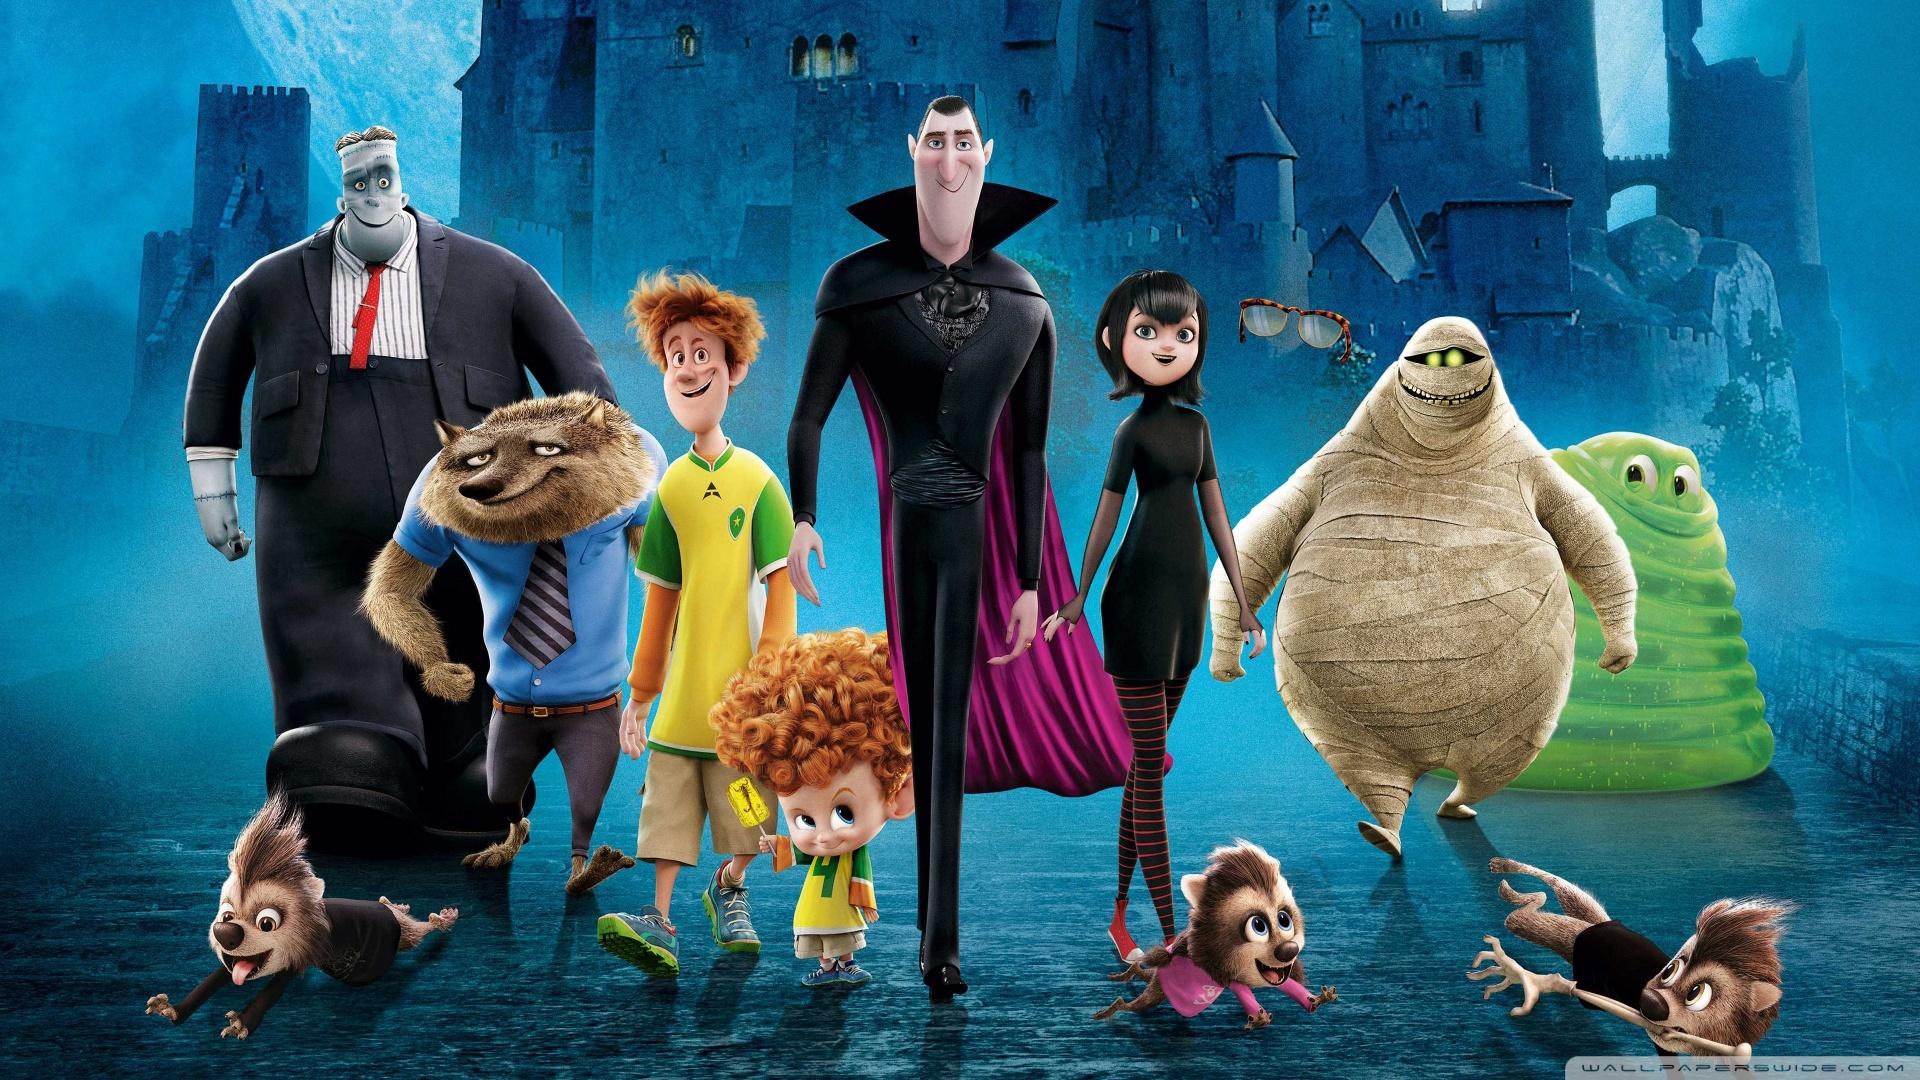 Free Full Cartoon Movies free hotel transylvania 2 cartoon movie hd wallpaper - clip